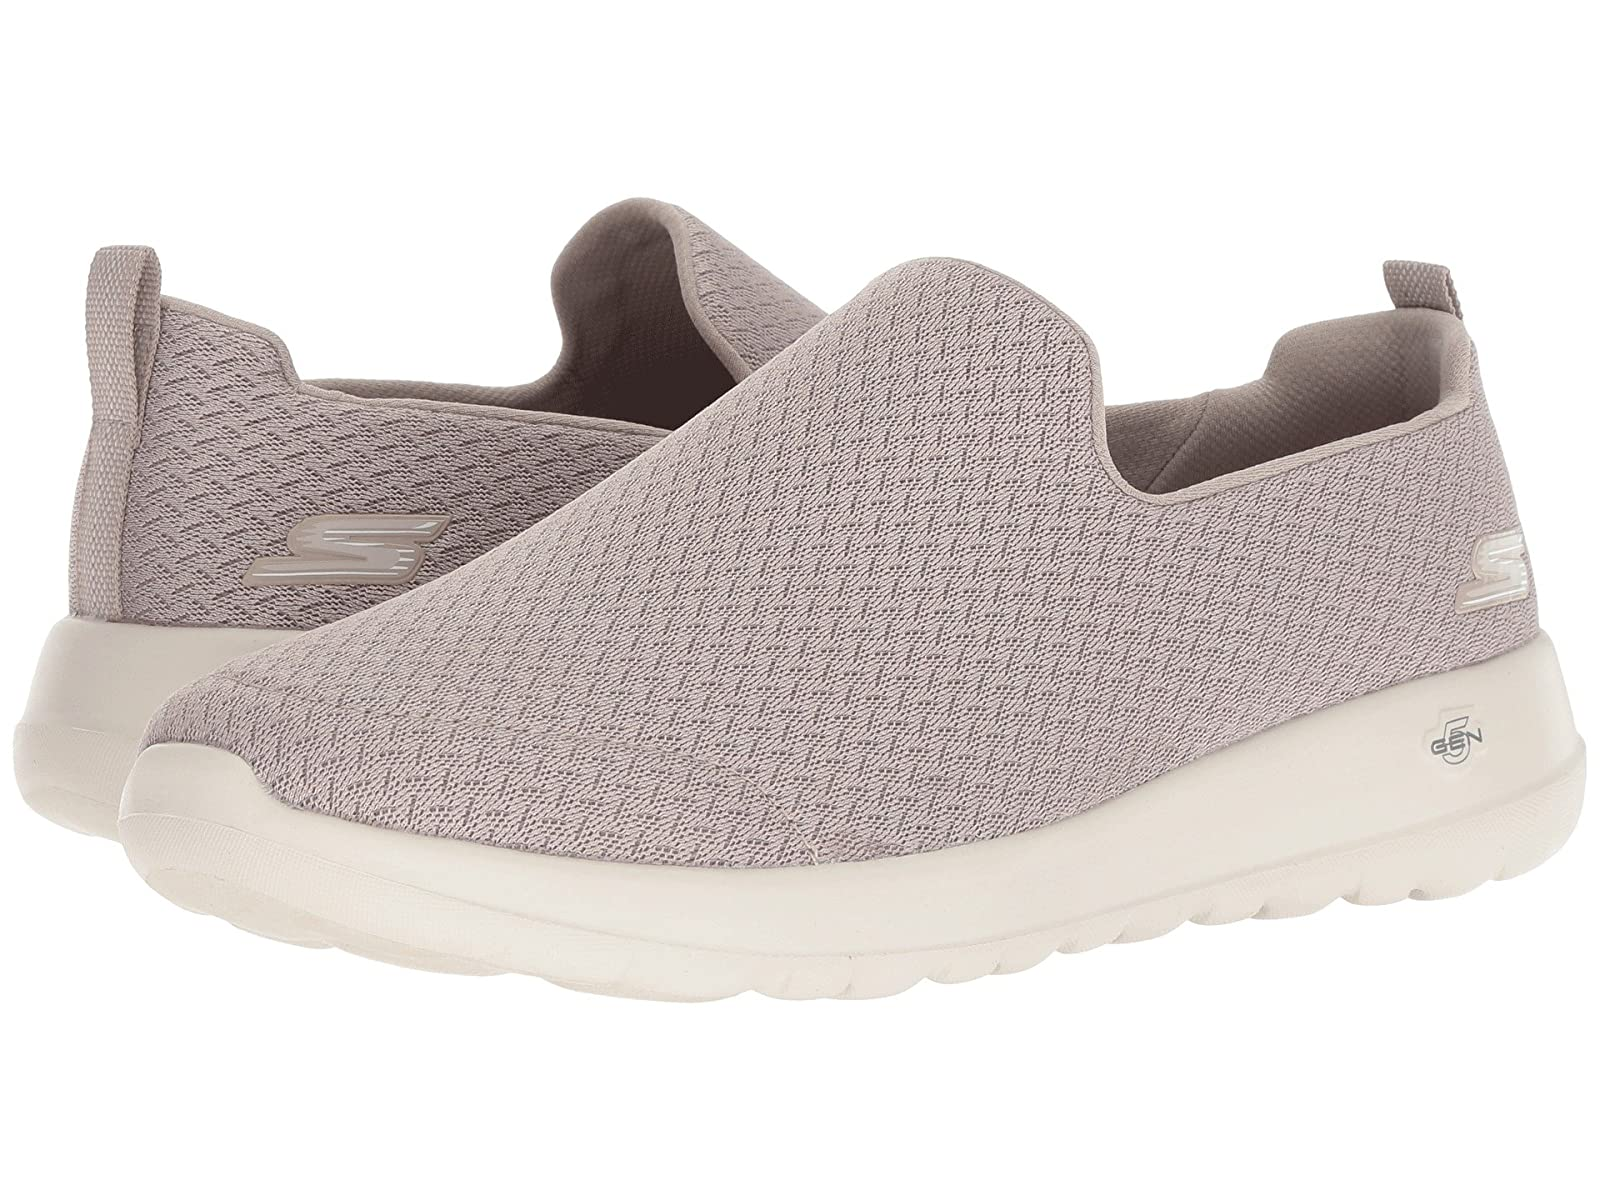 SKECHERS Performance Go Walk Max RejoiceAtmospheric grades have affordable shoes